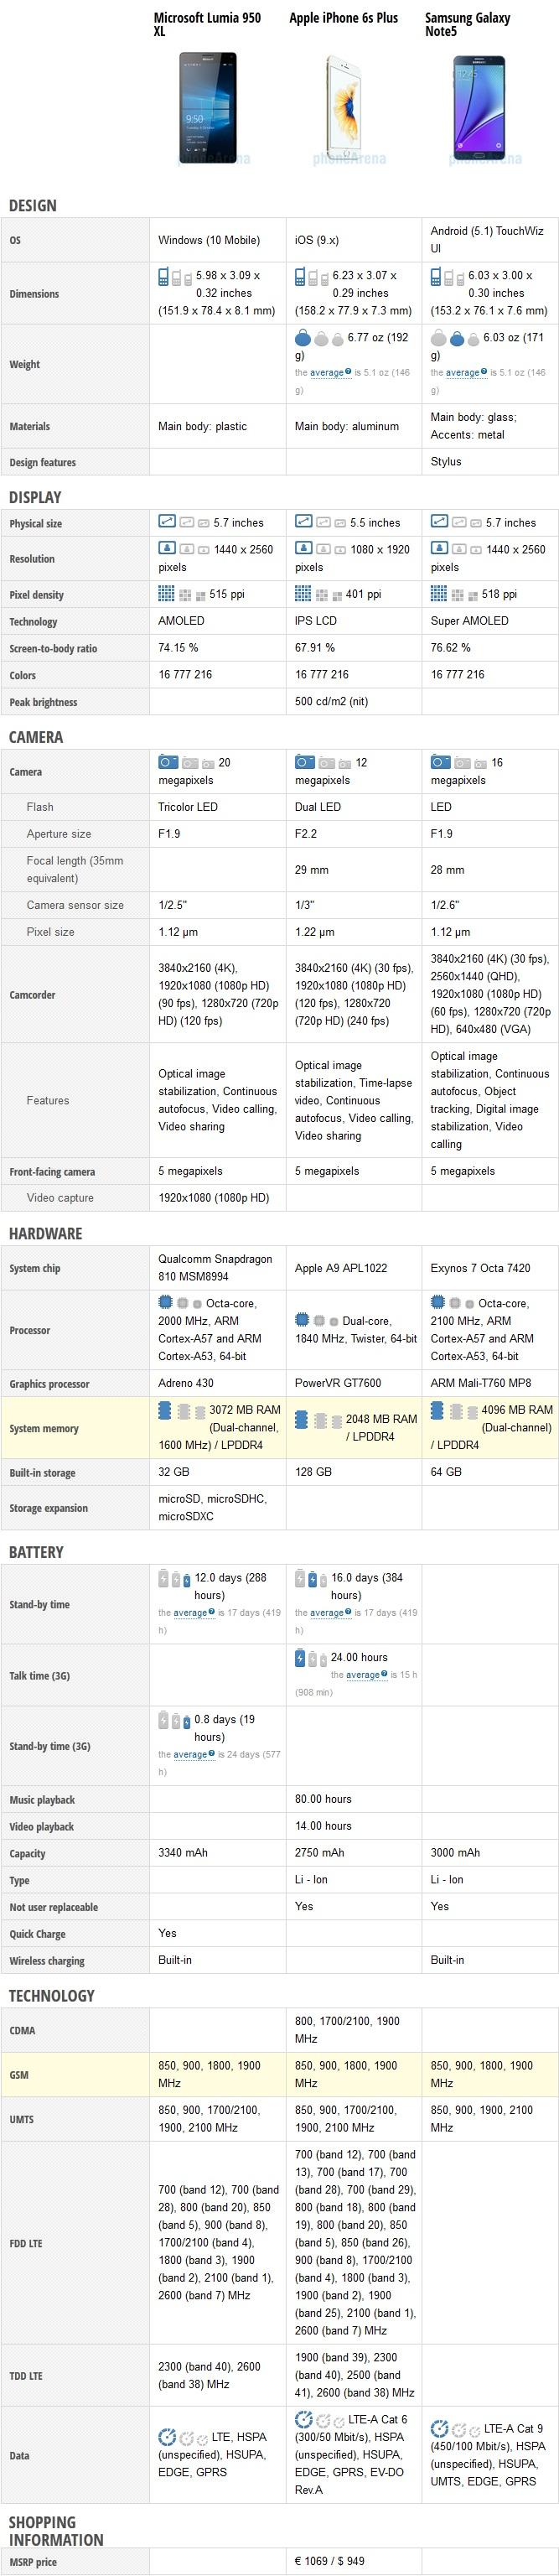 مقایسه مایکروسافت ۹۵۰ ایکس ال با آیفون ۶ اس پلاس، گلکسی نوت ۵